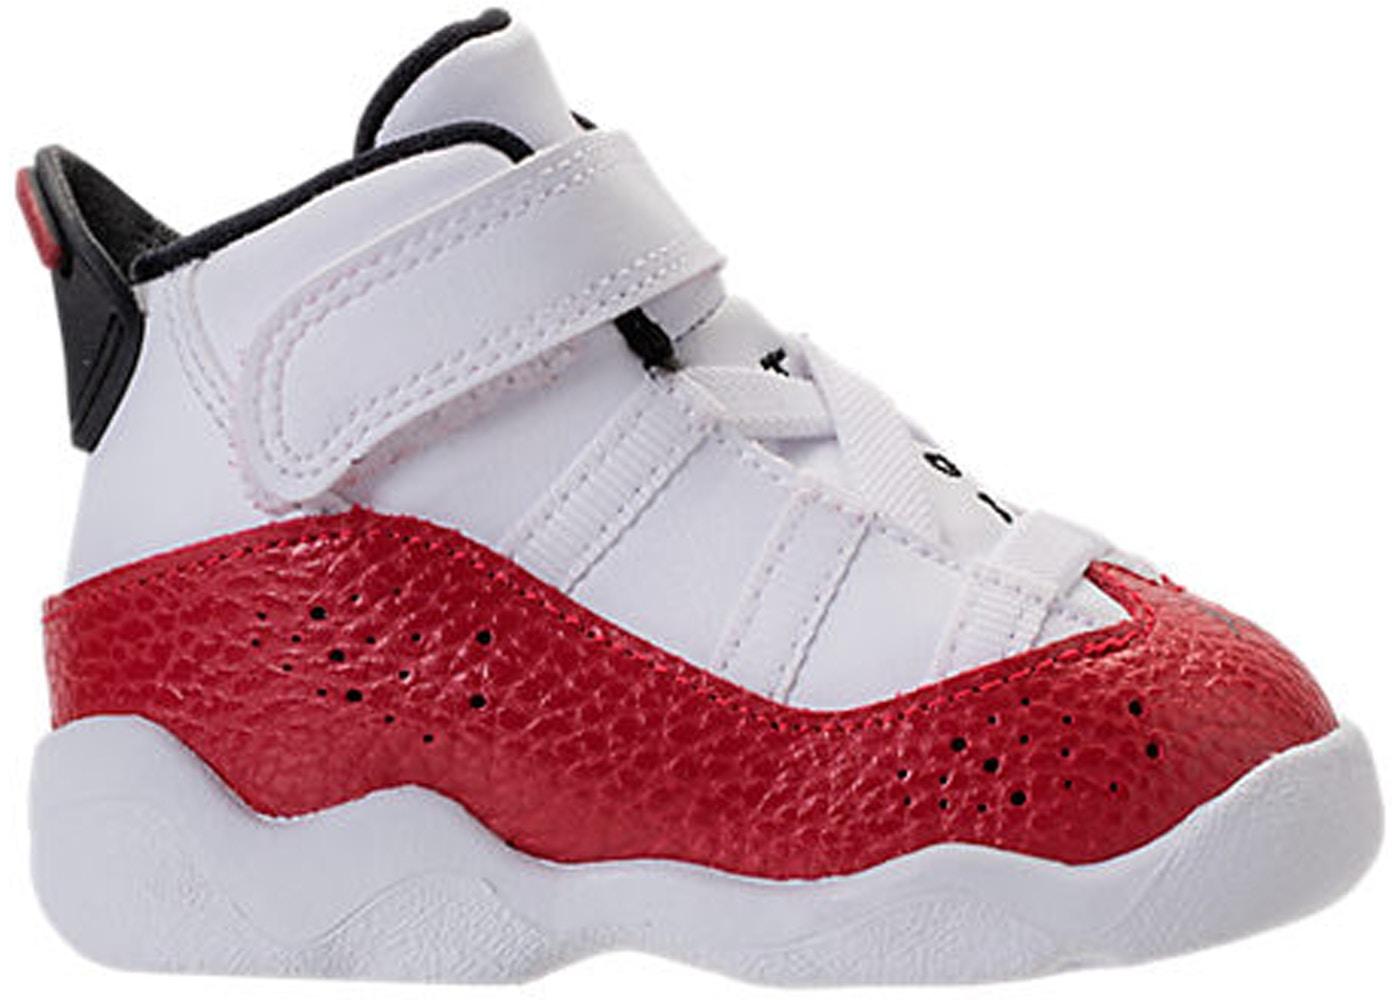 sale retailer 28c8f 5de4c Jordan 6 Rings White University Red (TD)